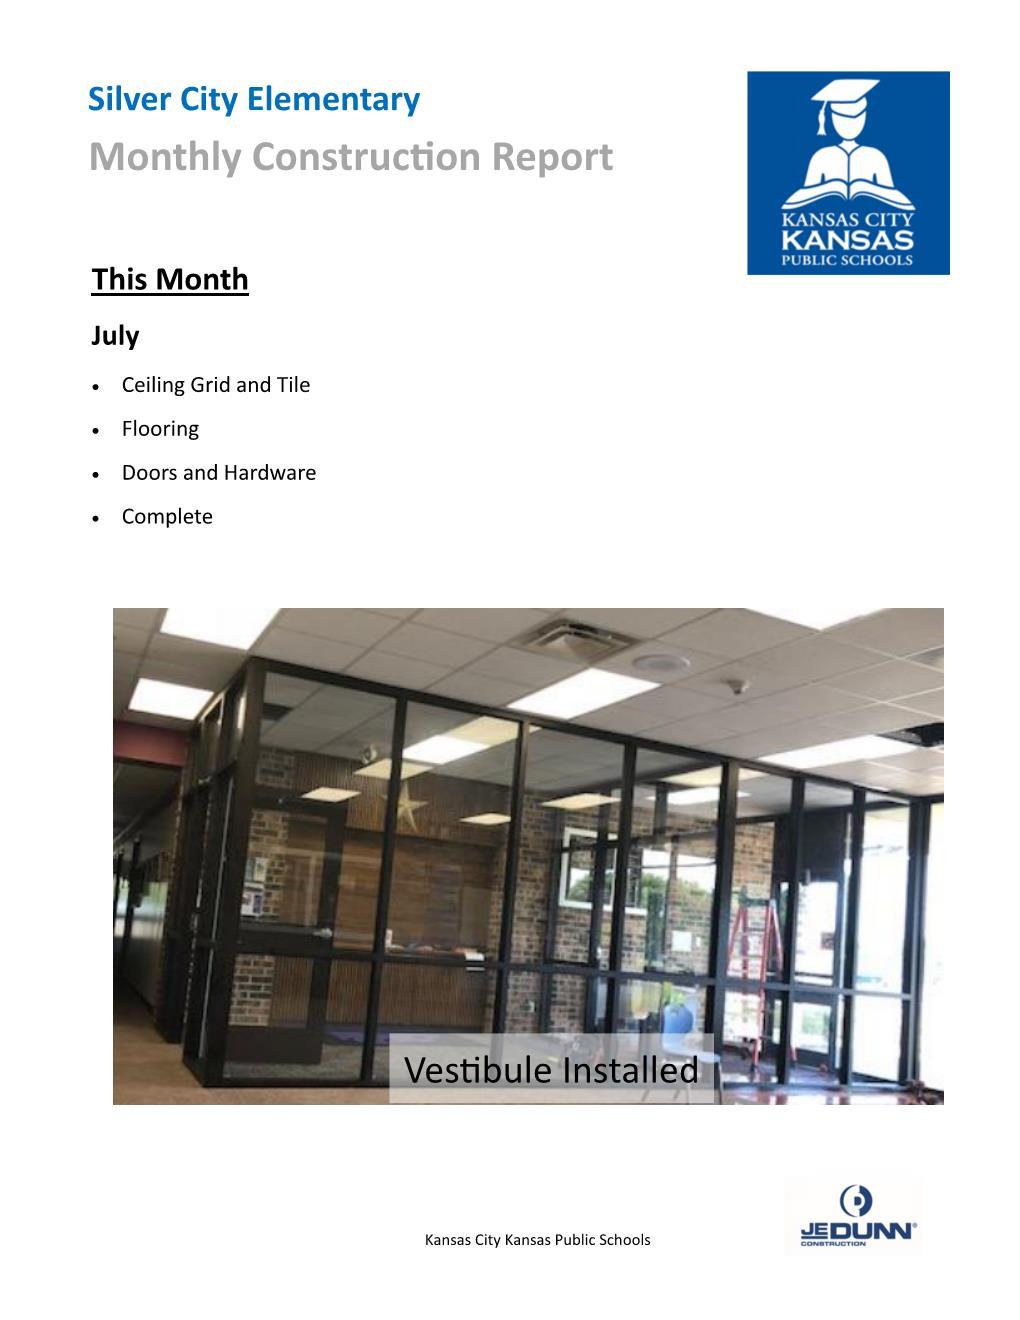 2018.07.16 - WP 04 July Photo Report SCE.jpg